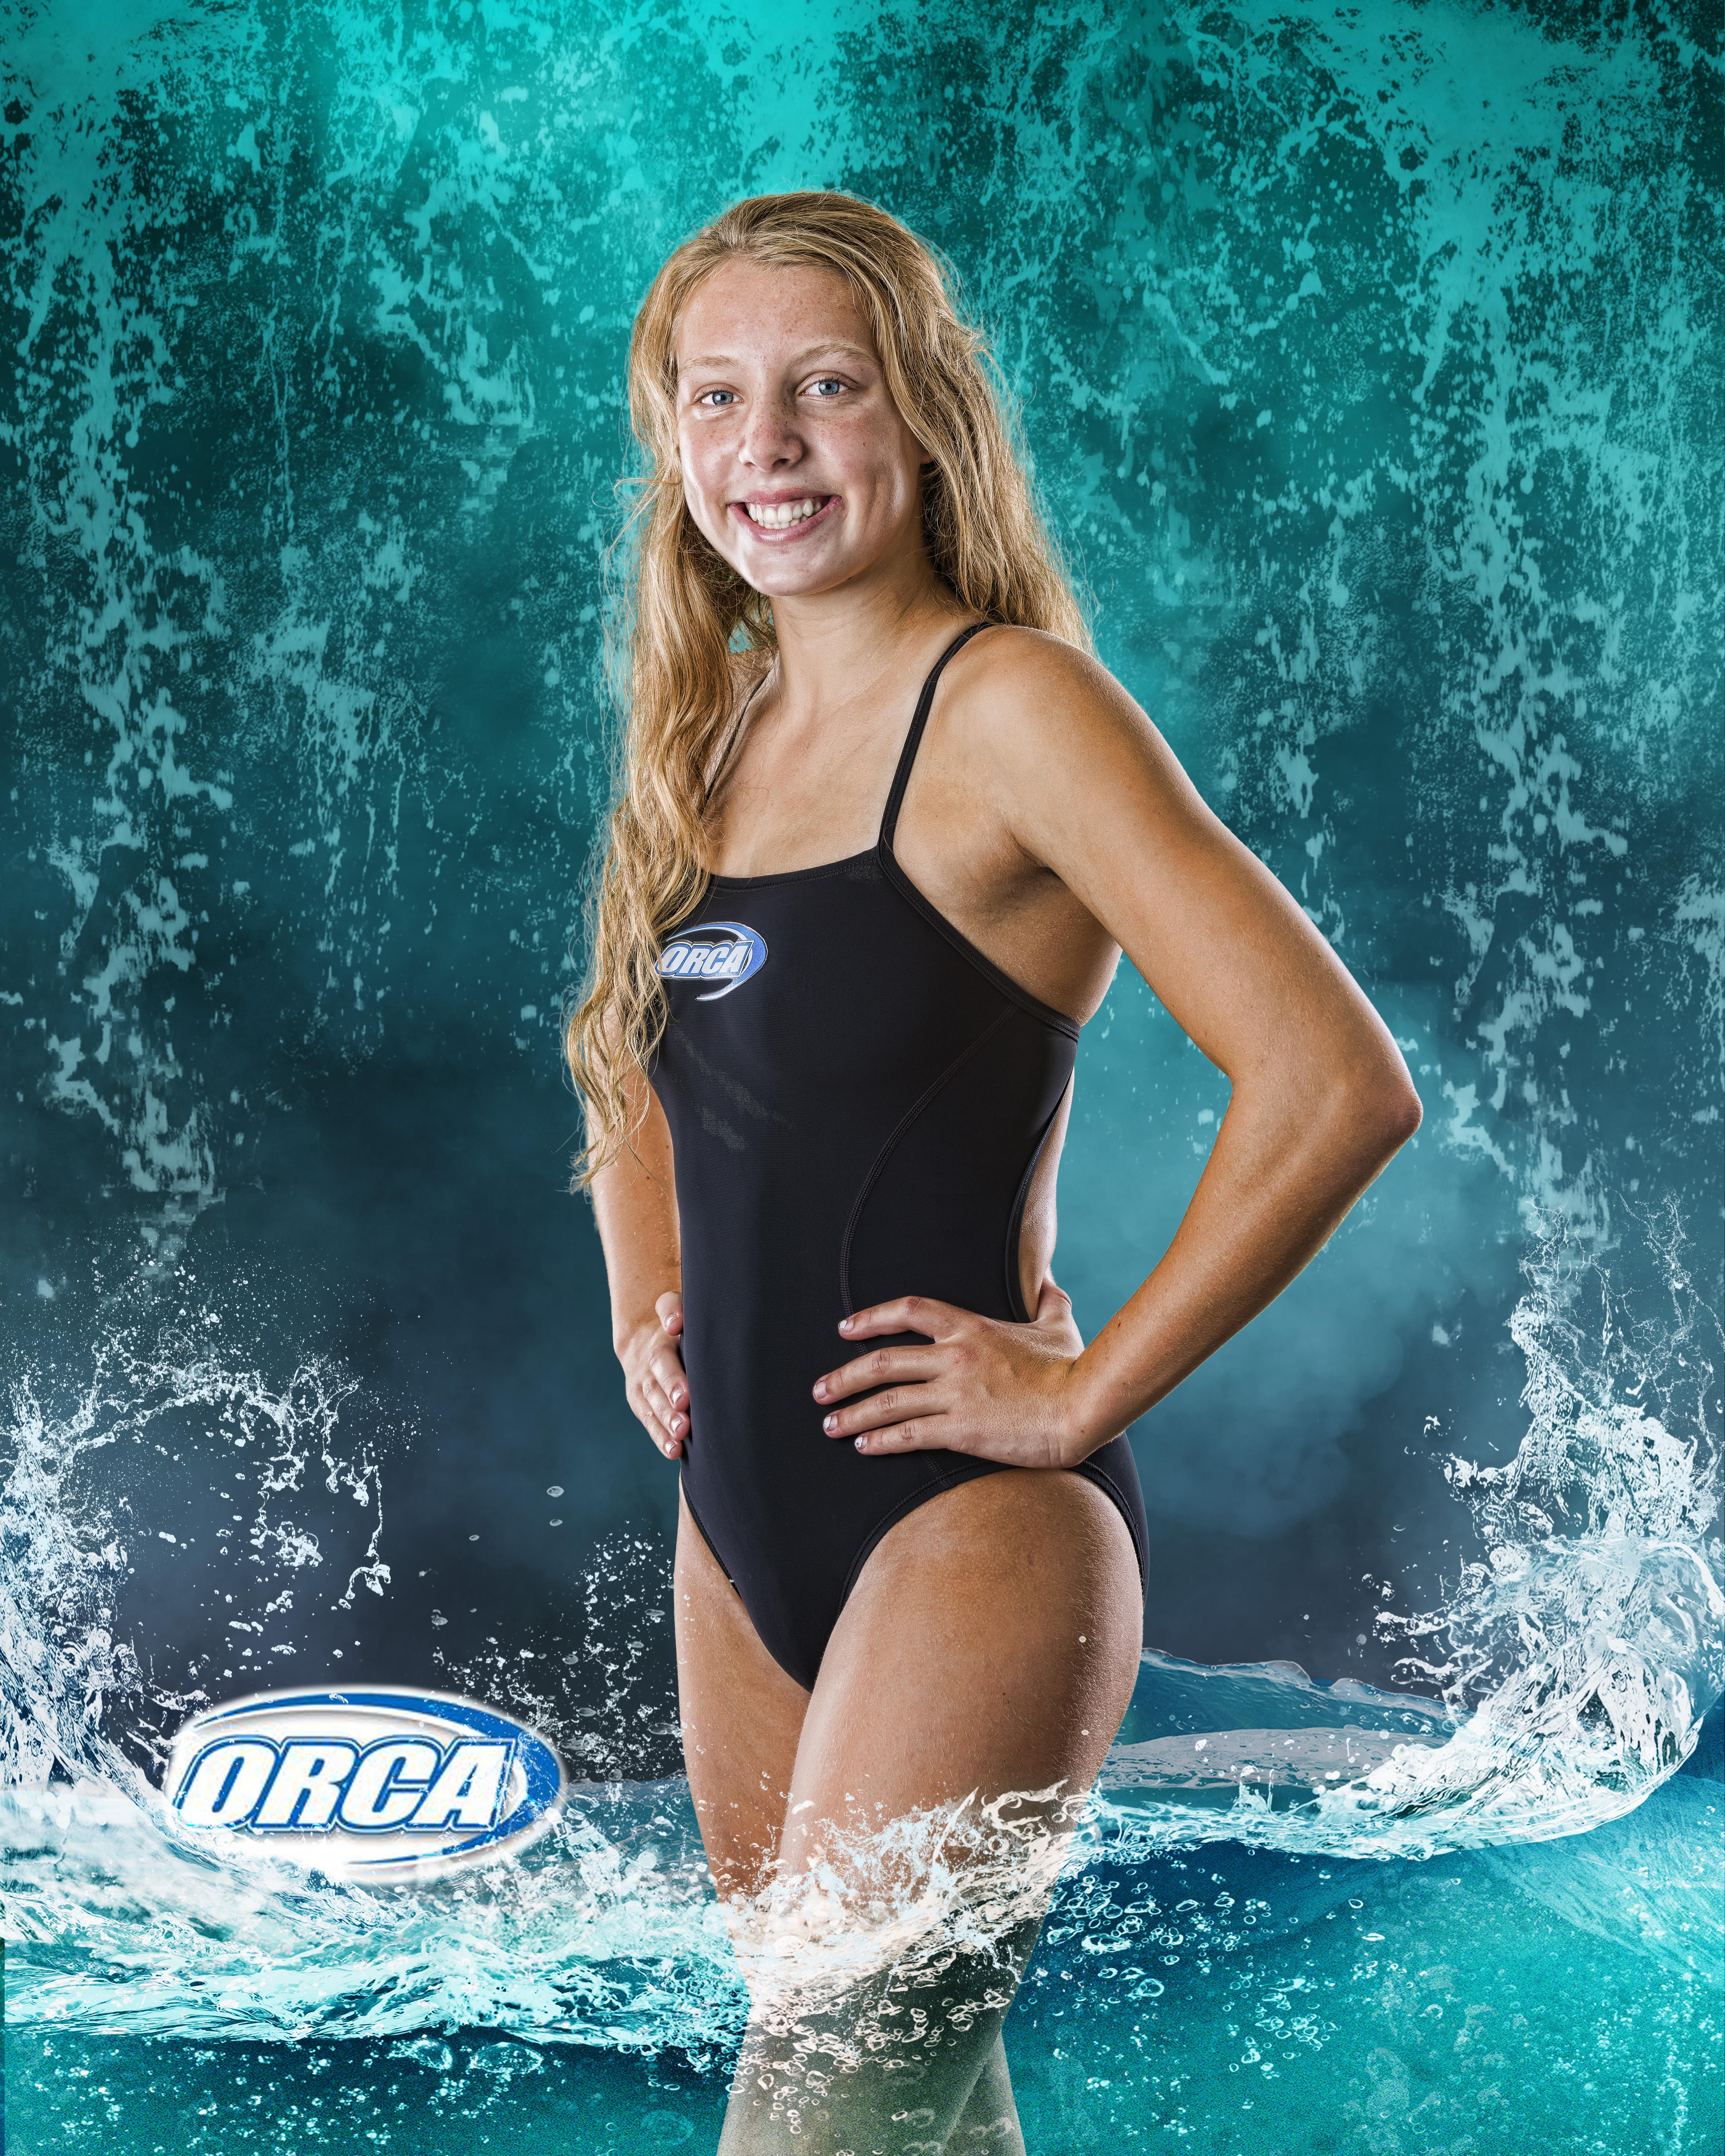 ORCA Swim-1-Test-A